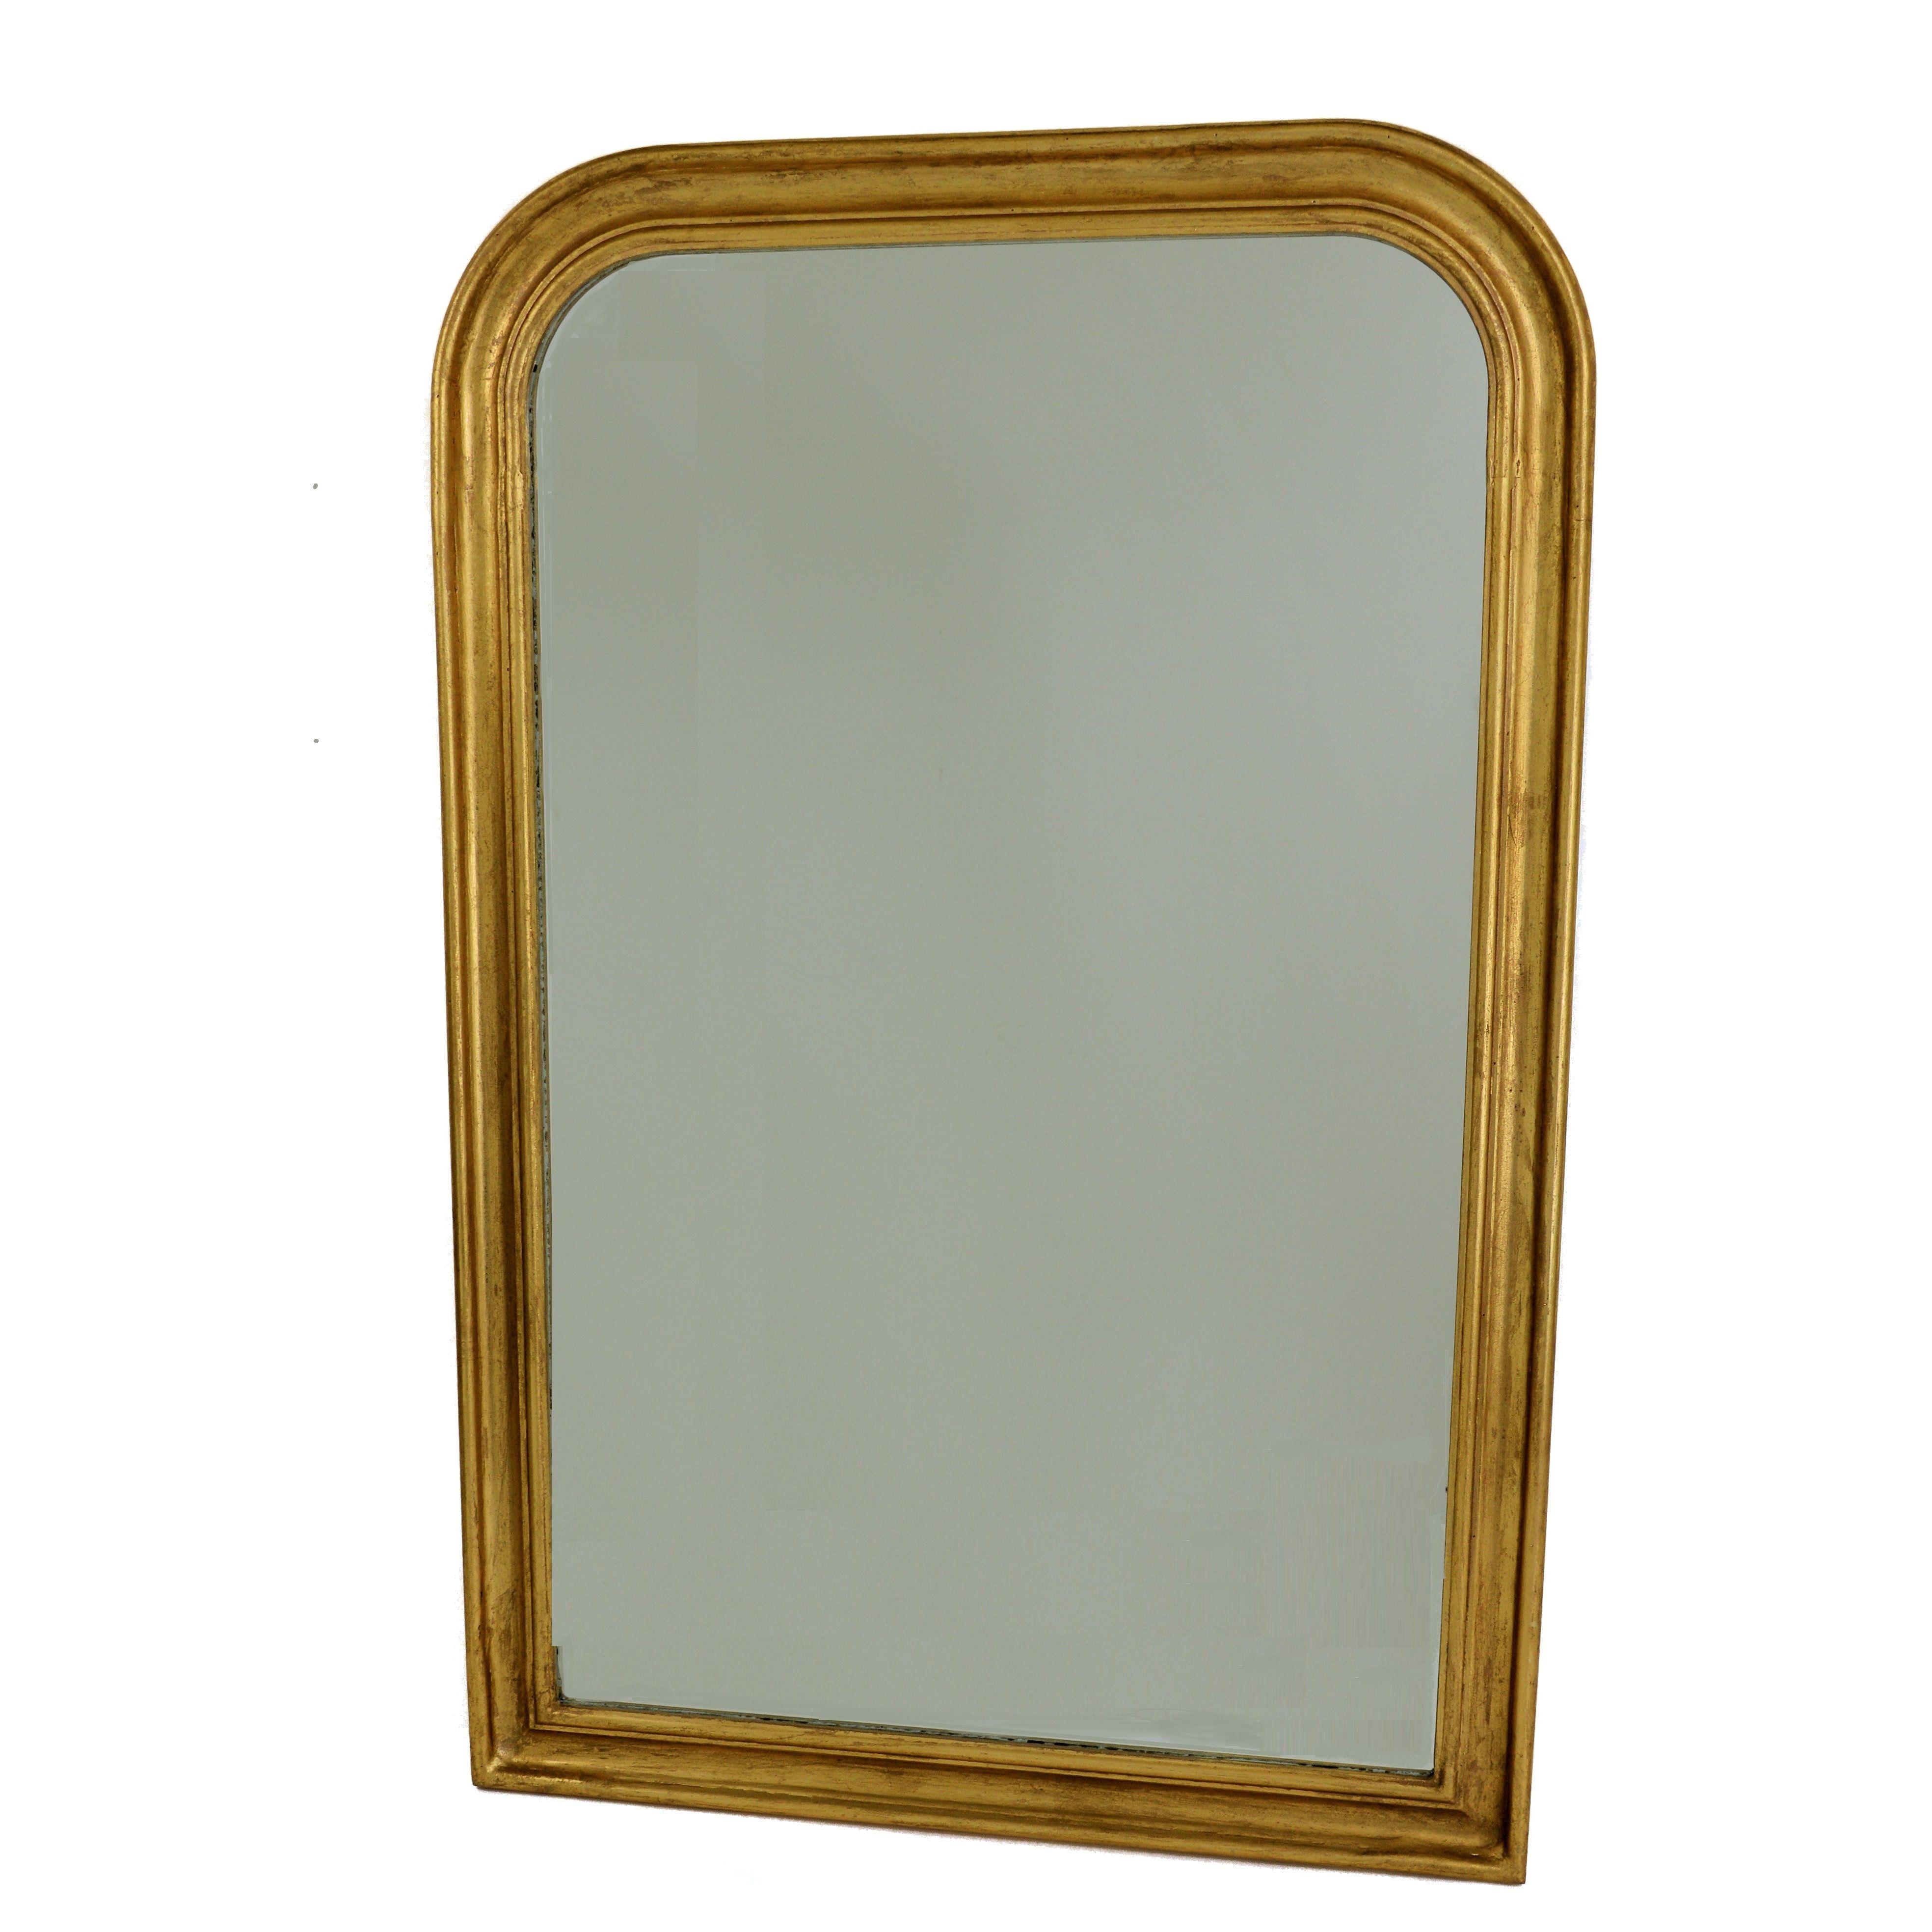 Nova Gold Leaf Wooden Louis Philippe Mirror Size 36 X 54 H